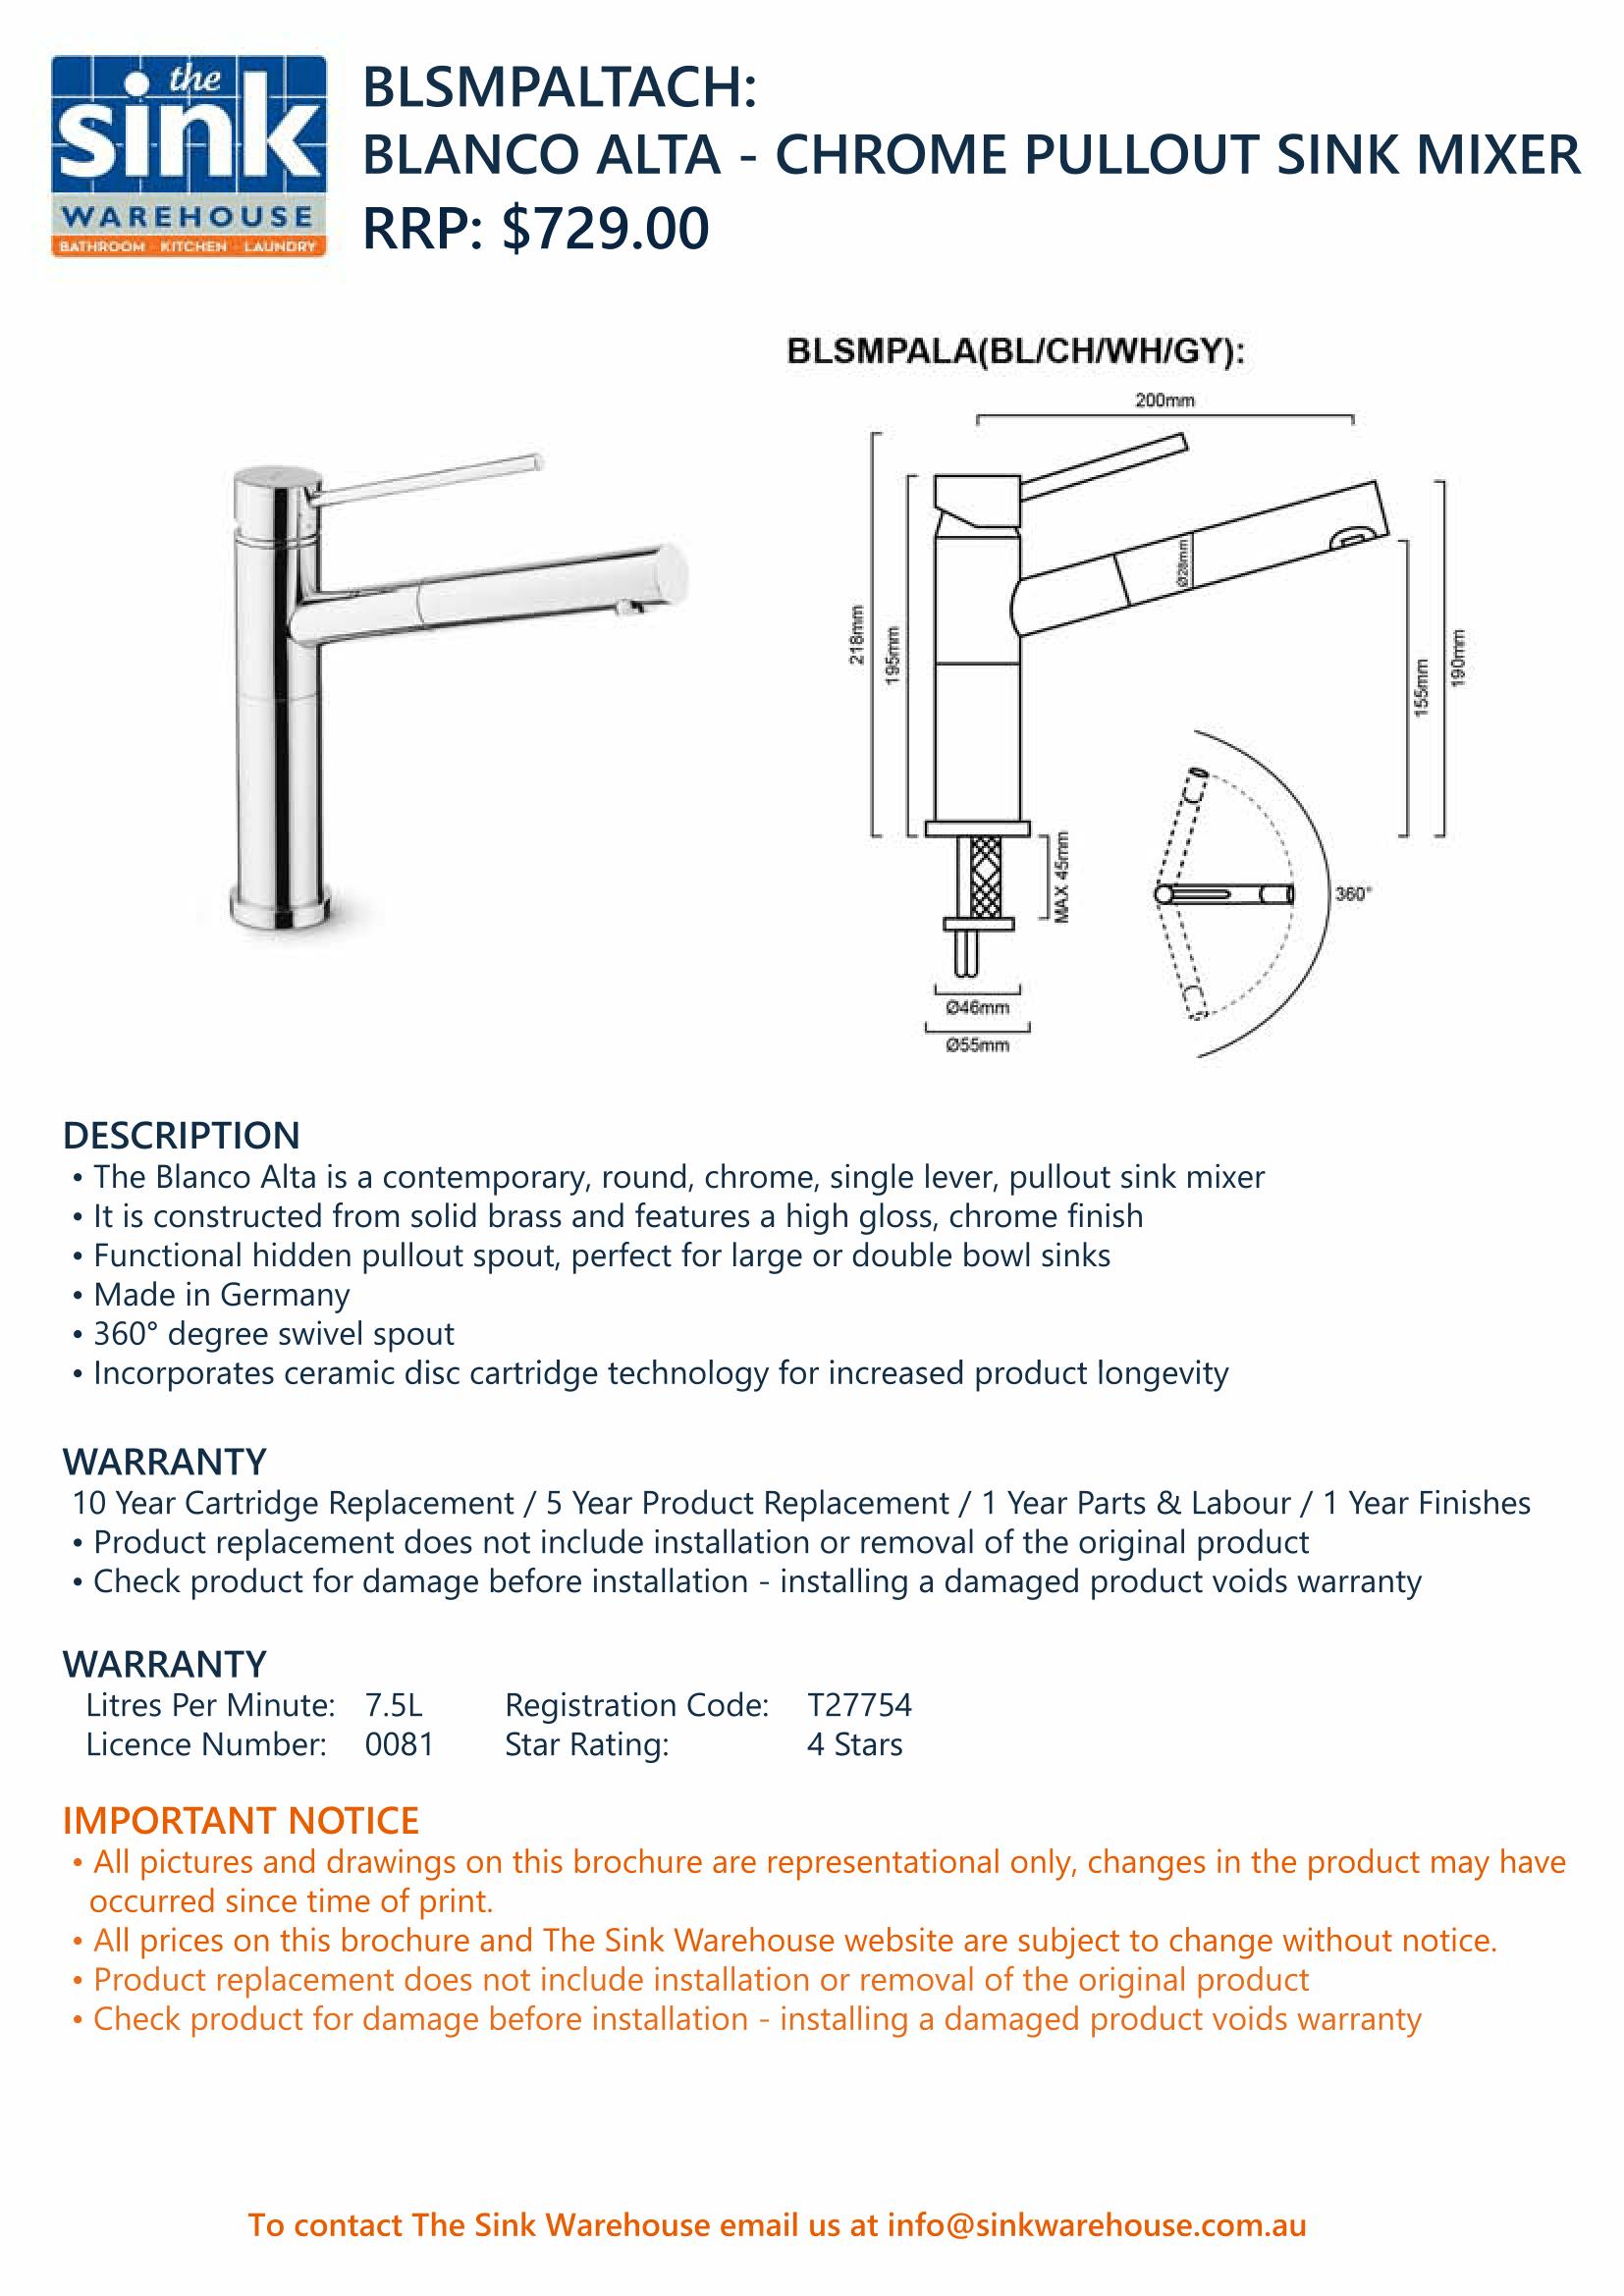 blsmpaltach-product-spec-sheet-1.png